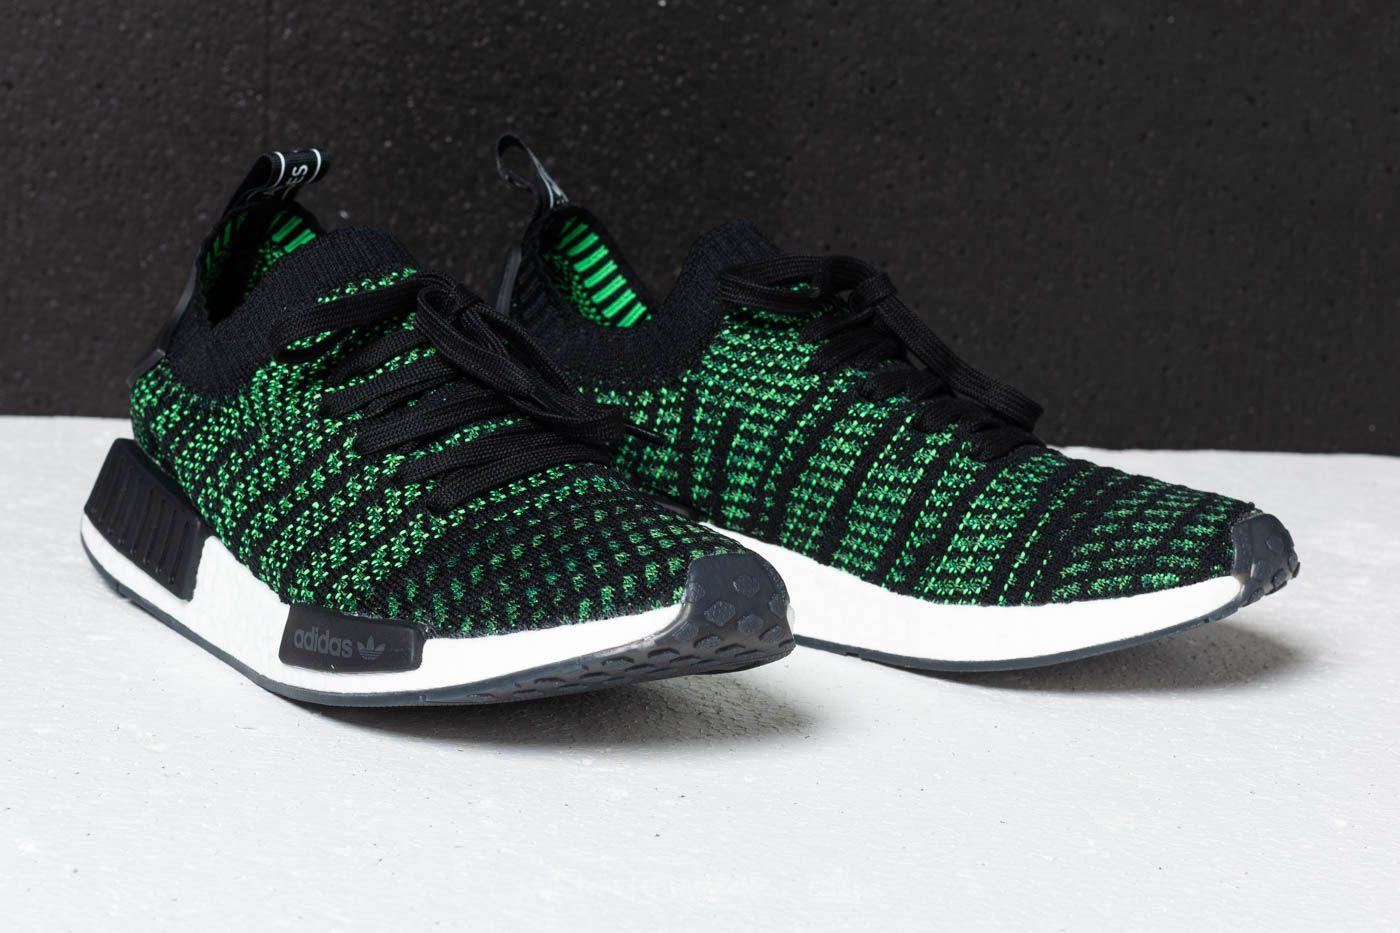 Adidas Nmd R1 Stlt Primeknit Black Green White Footshop